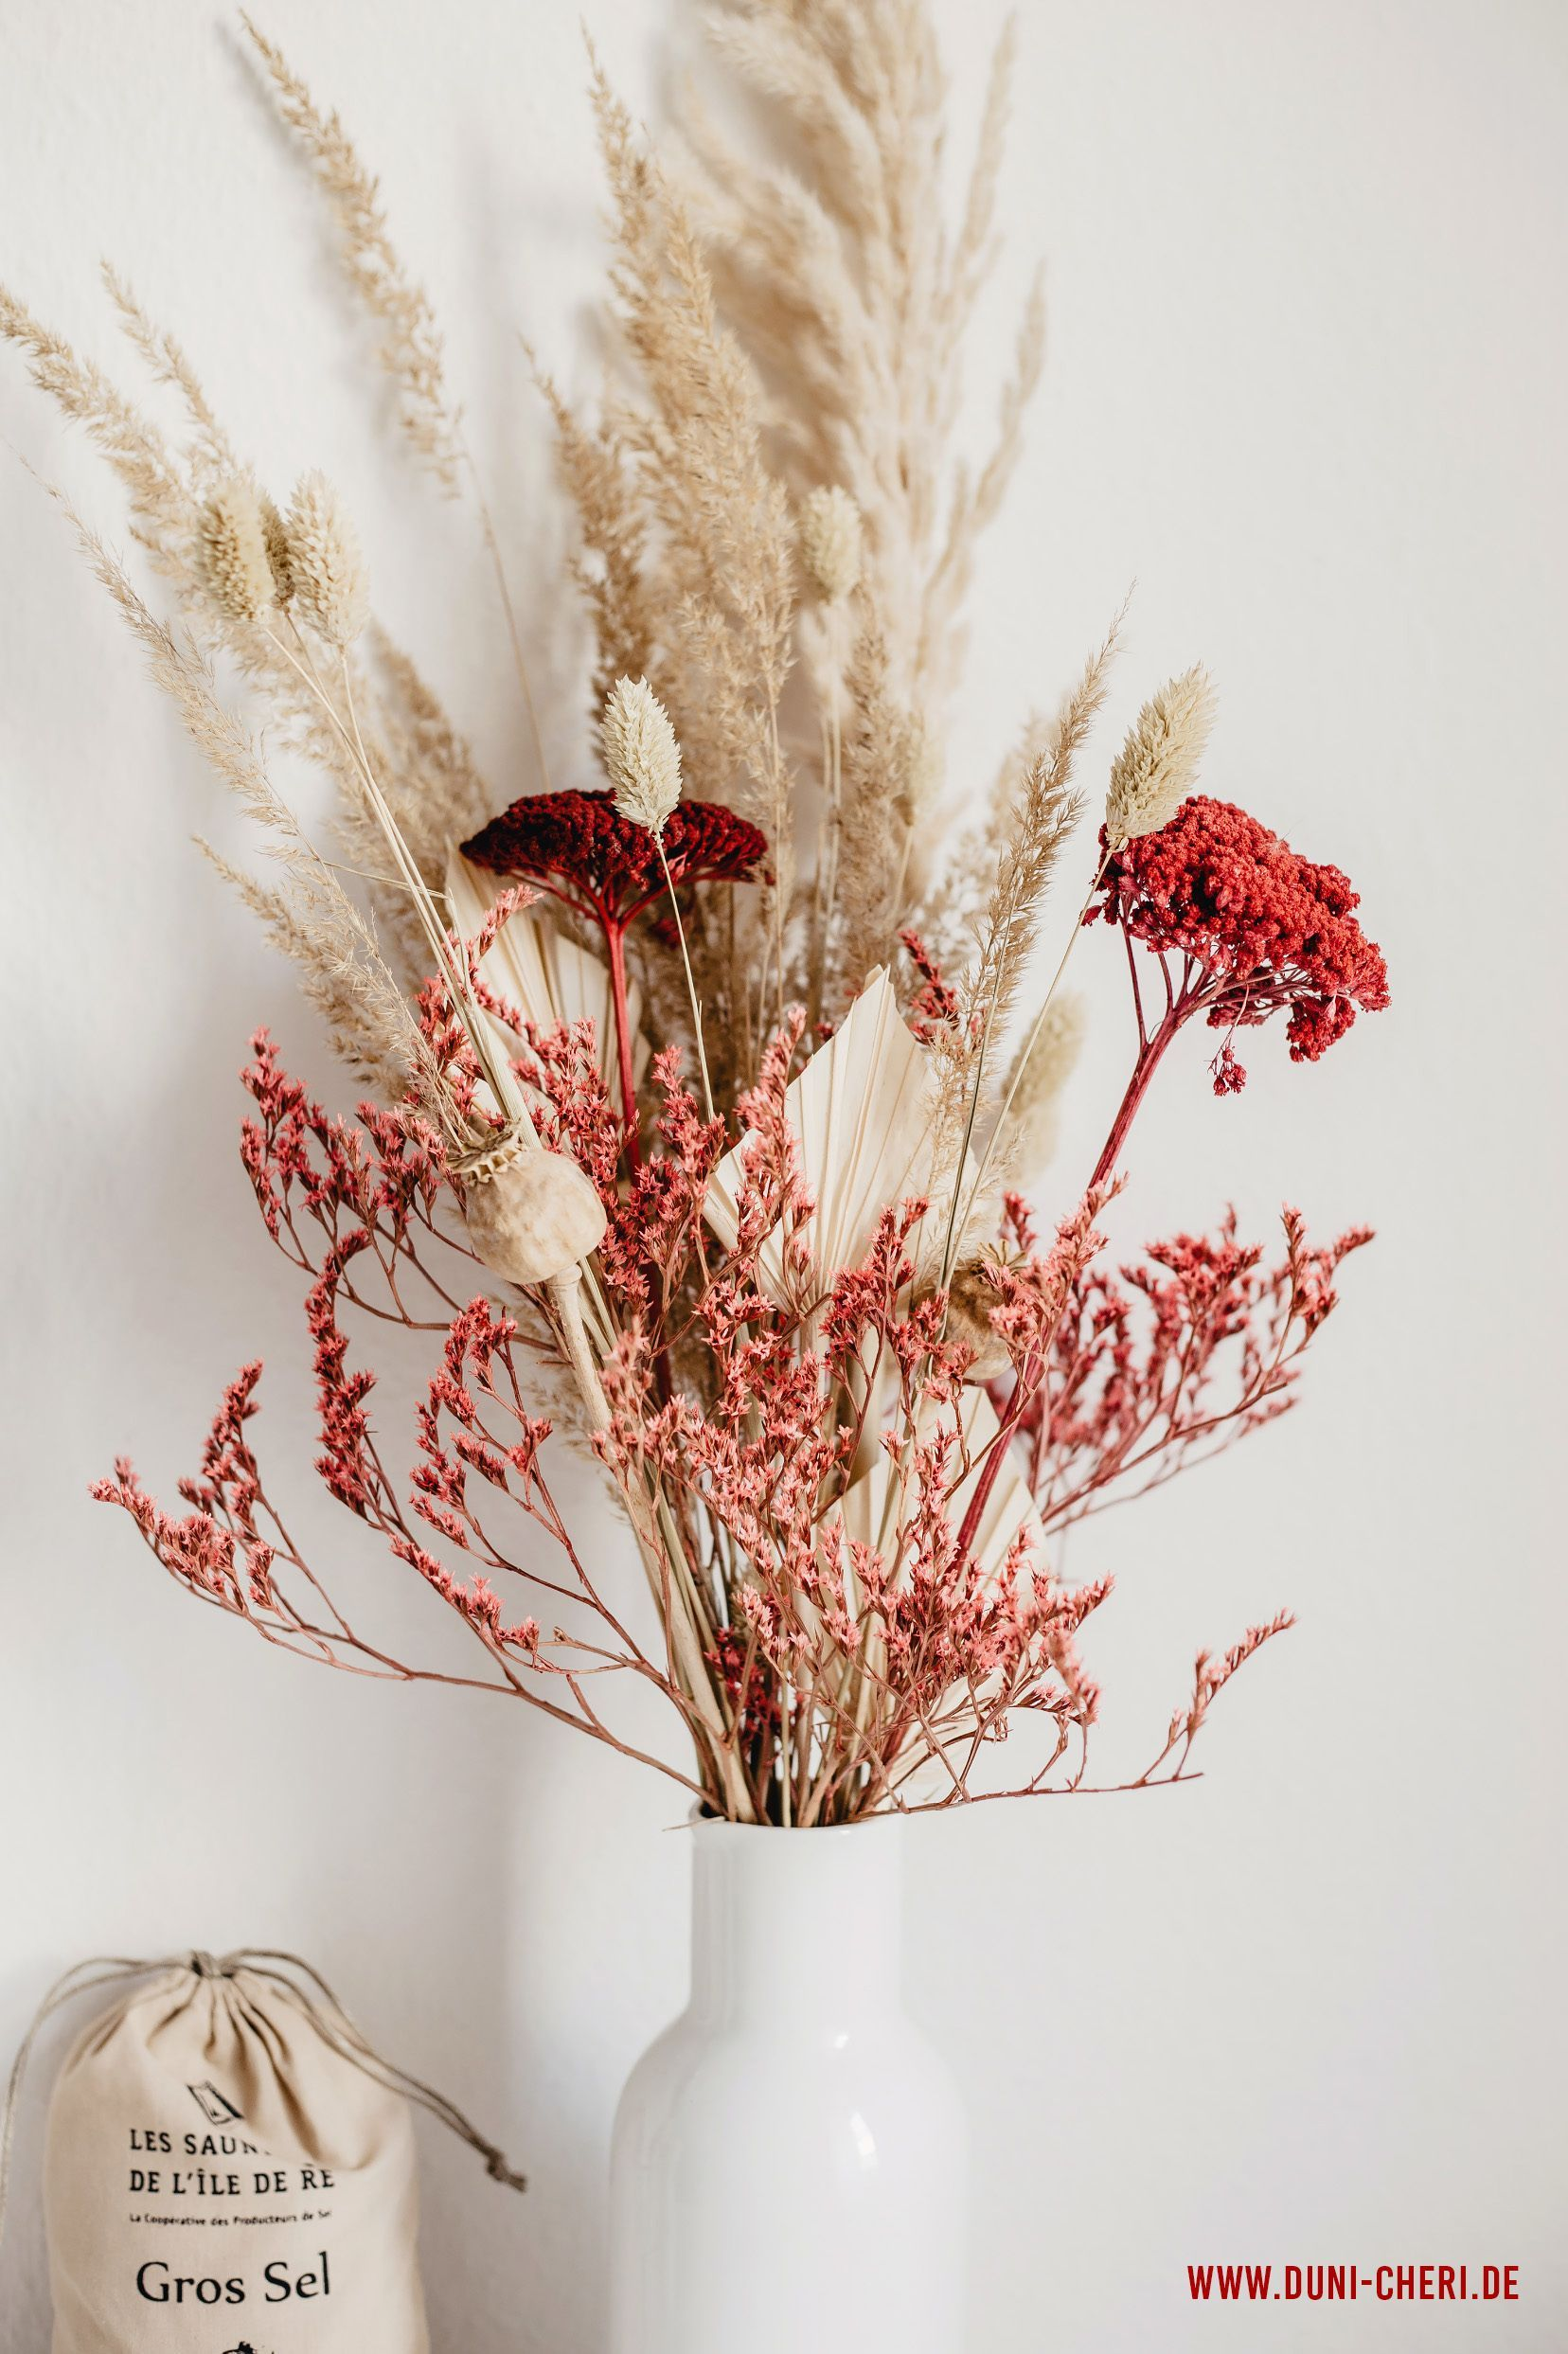 Getrocknete Blumen Gesteck Vase Rot Natur Blumen Gesteck Getrocknete Natur Rot Vase In 2020 Dried Flower Arrangements Dried Flowers Flower Arrangements